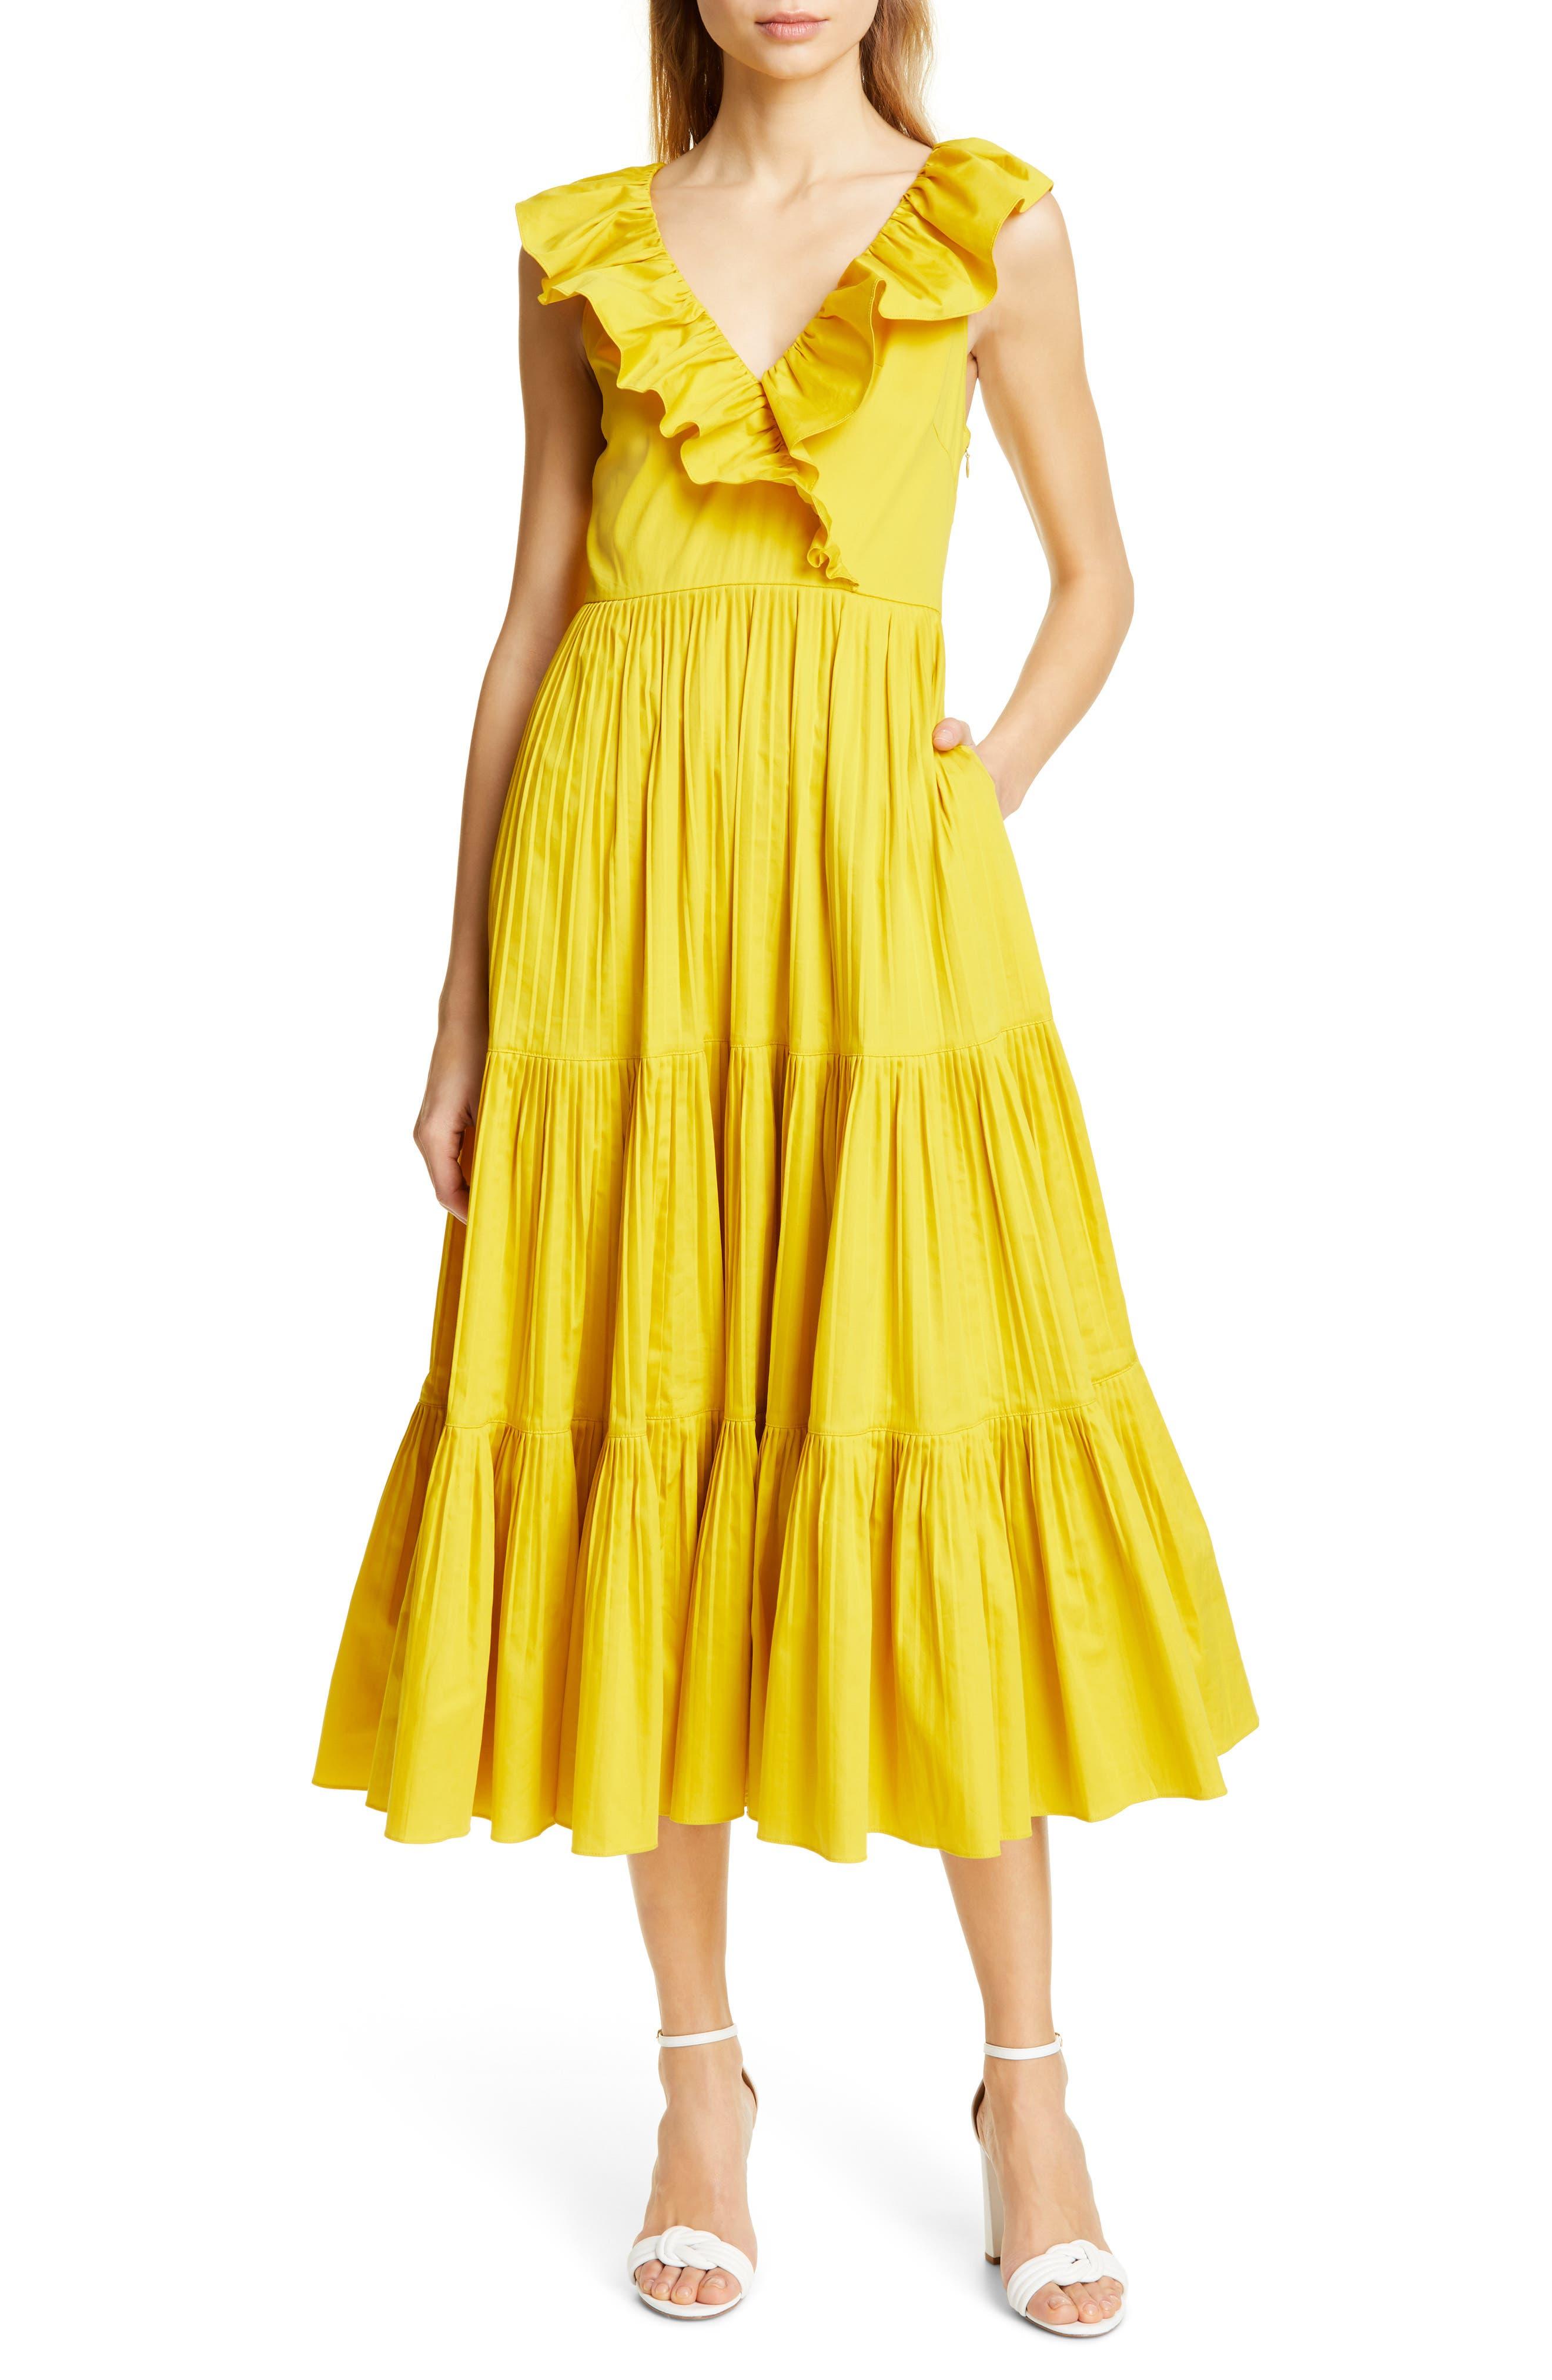 Kate Spade New York Tiered Poplin Dress, Yellow